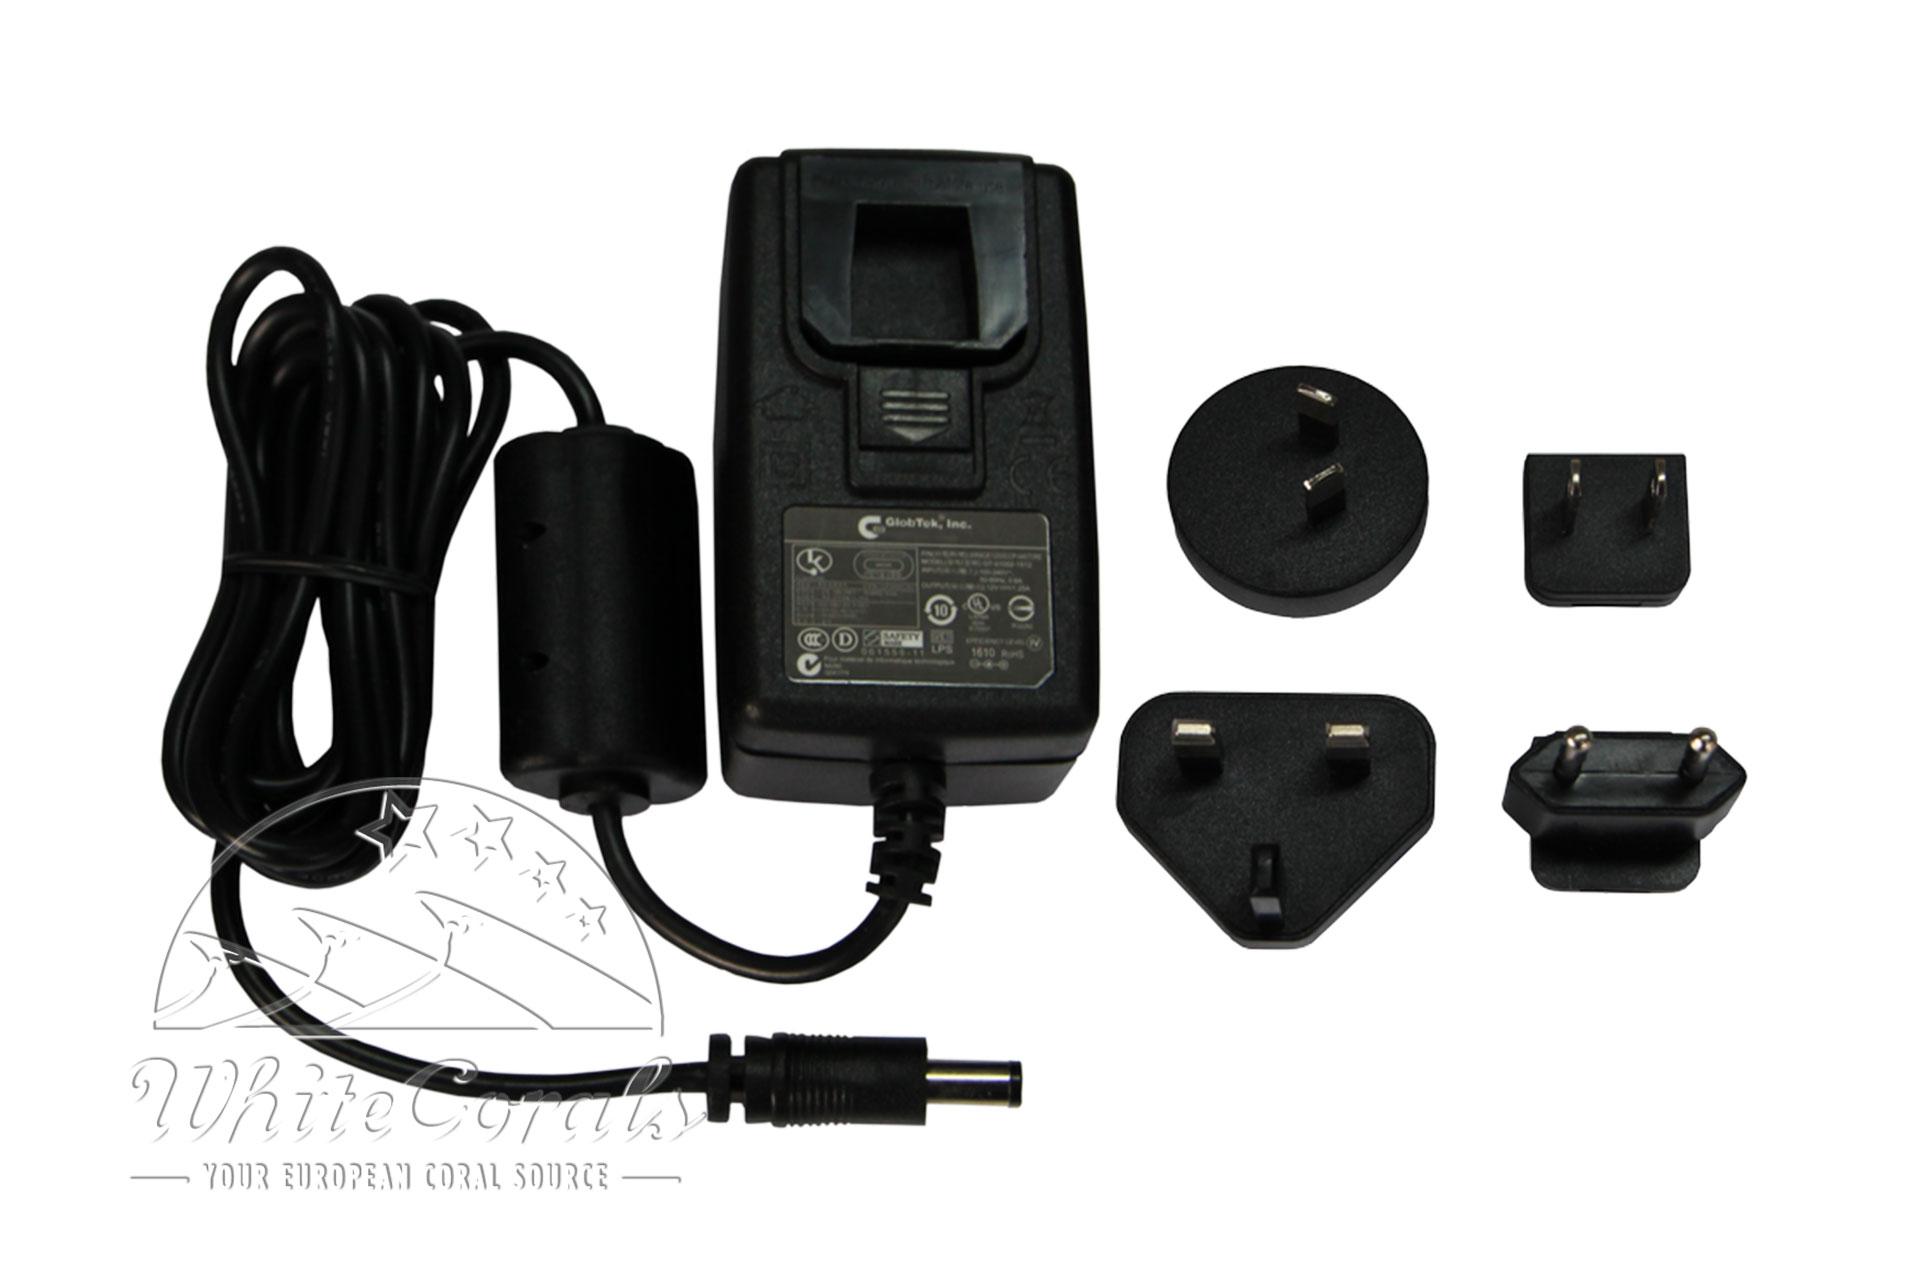 GHL Universal-Netzteil Profiluxserie (AC/DC-EUR)